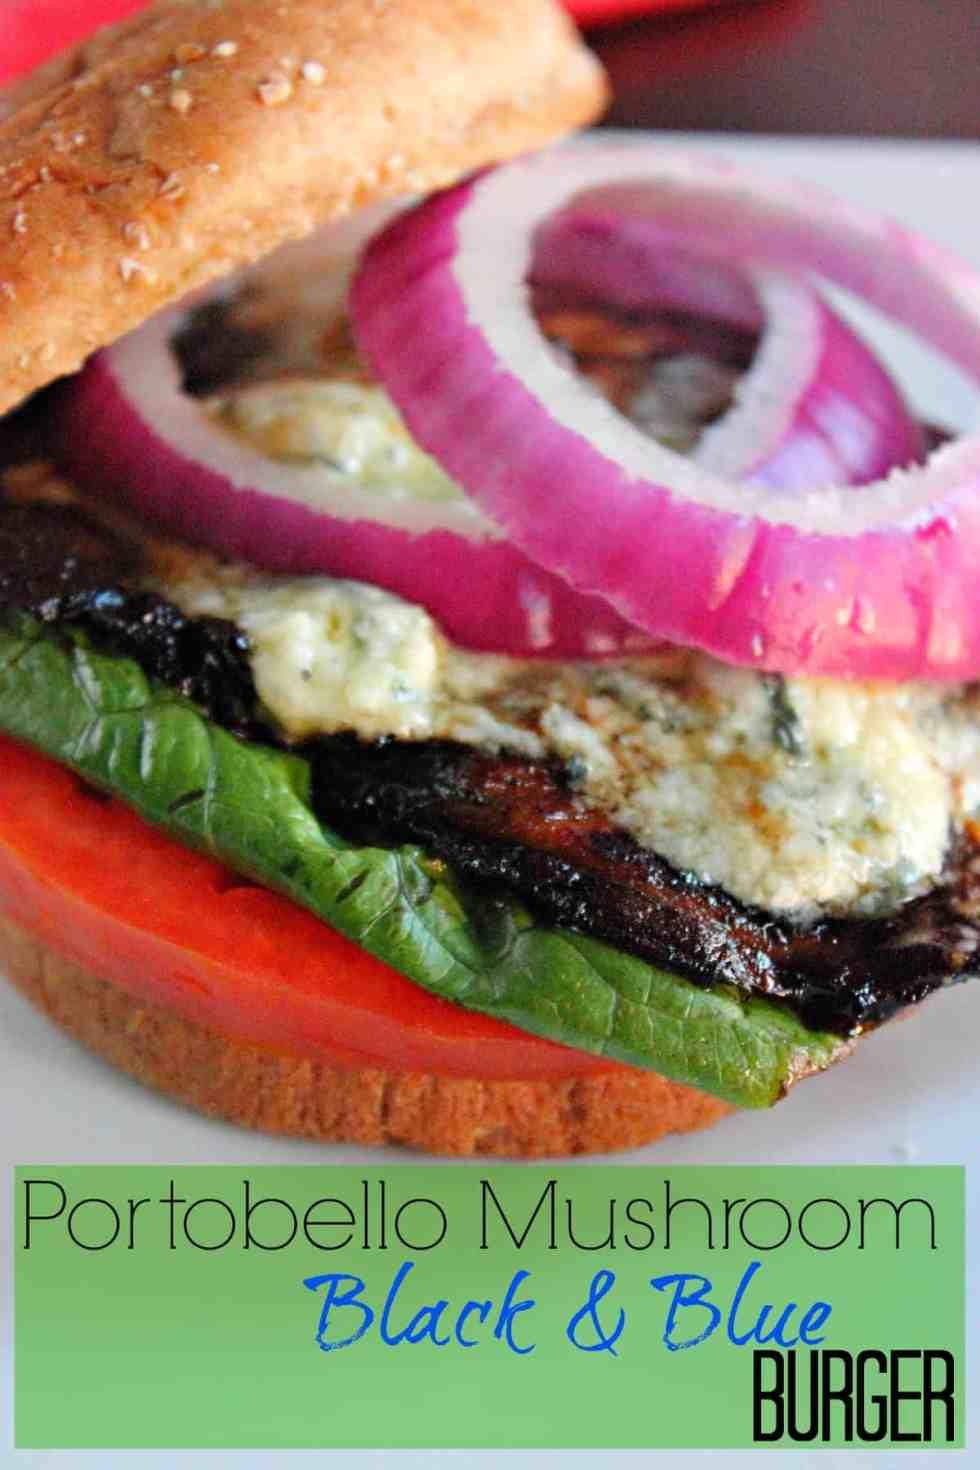 Portabella Mushroom Black and Blue Burger